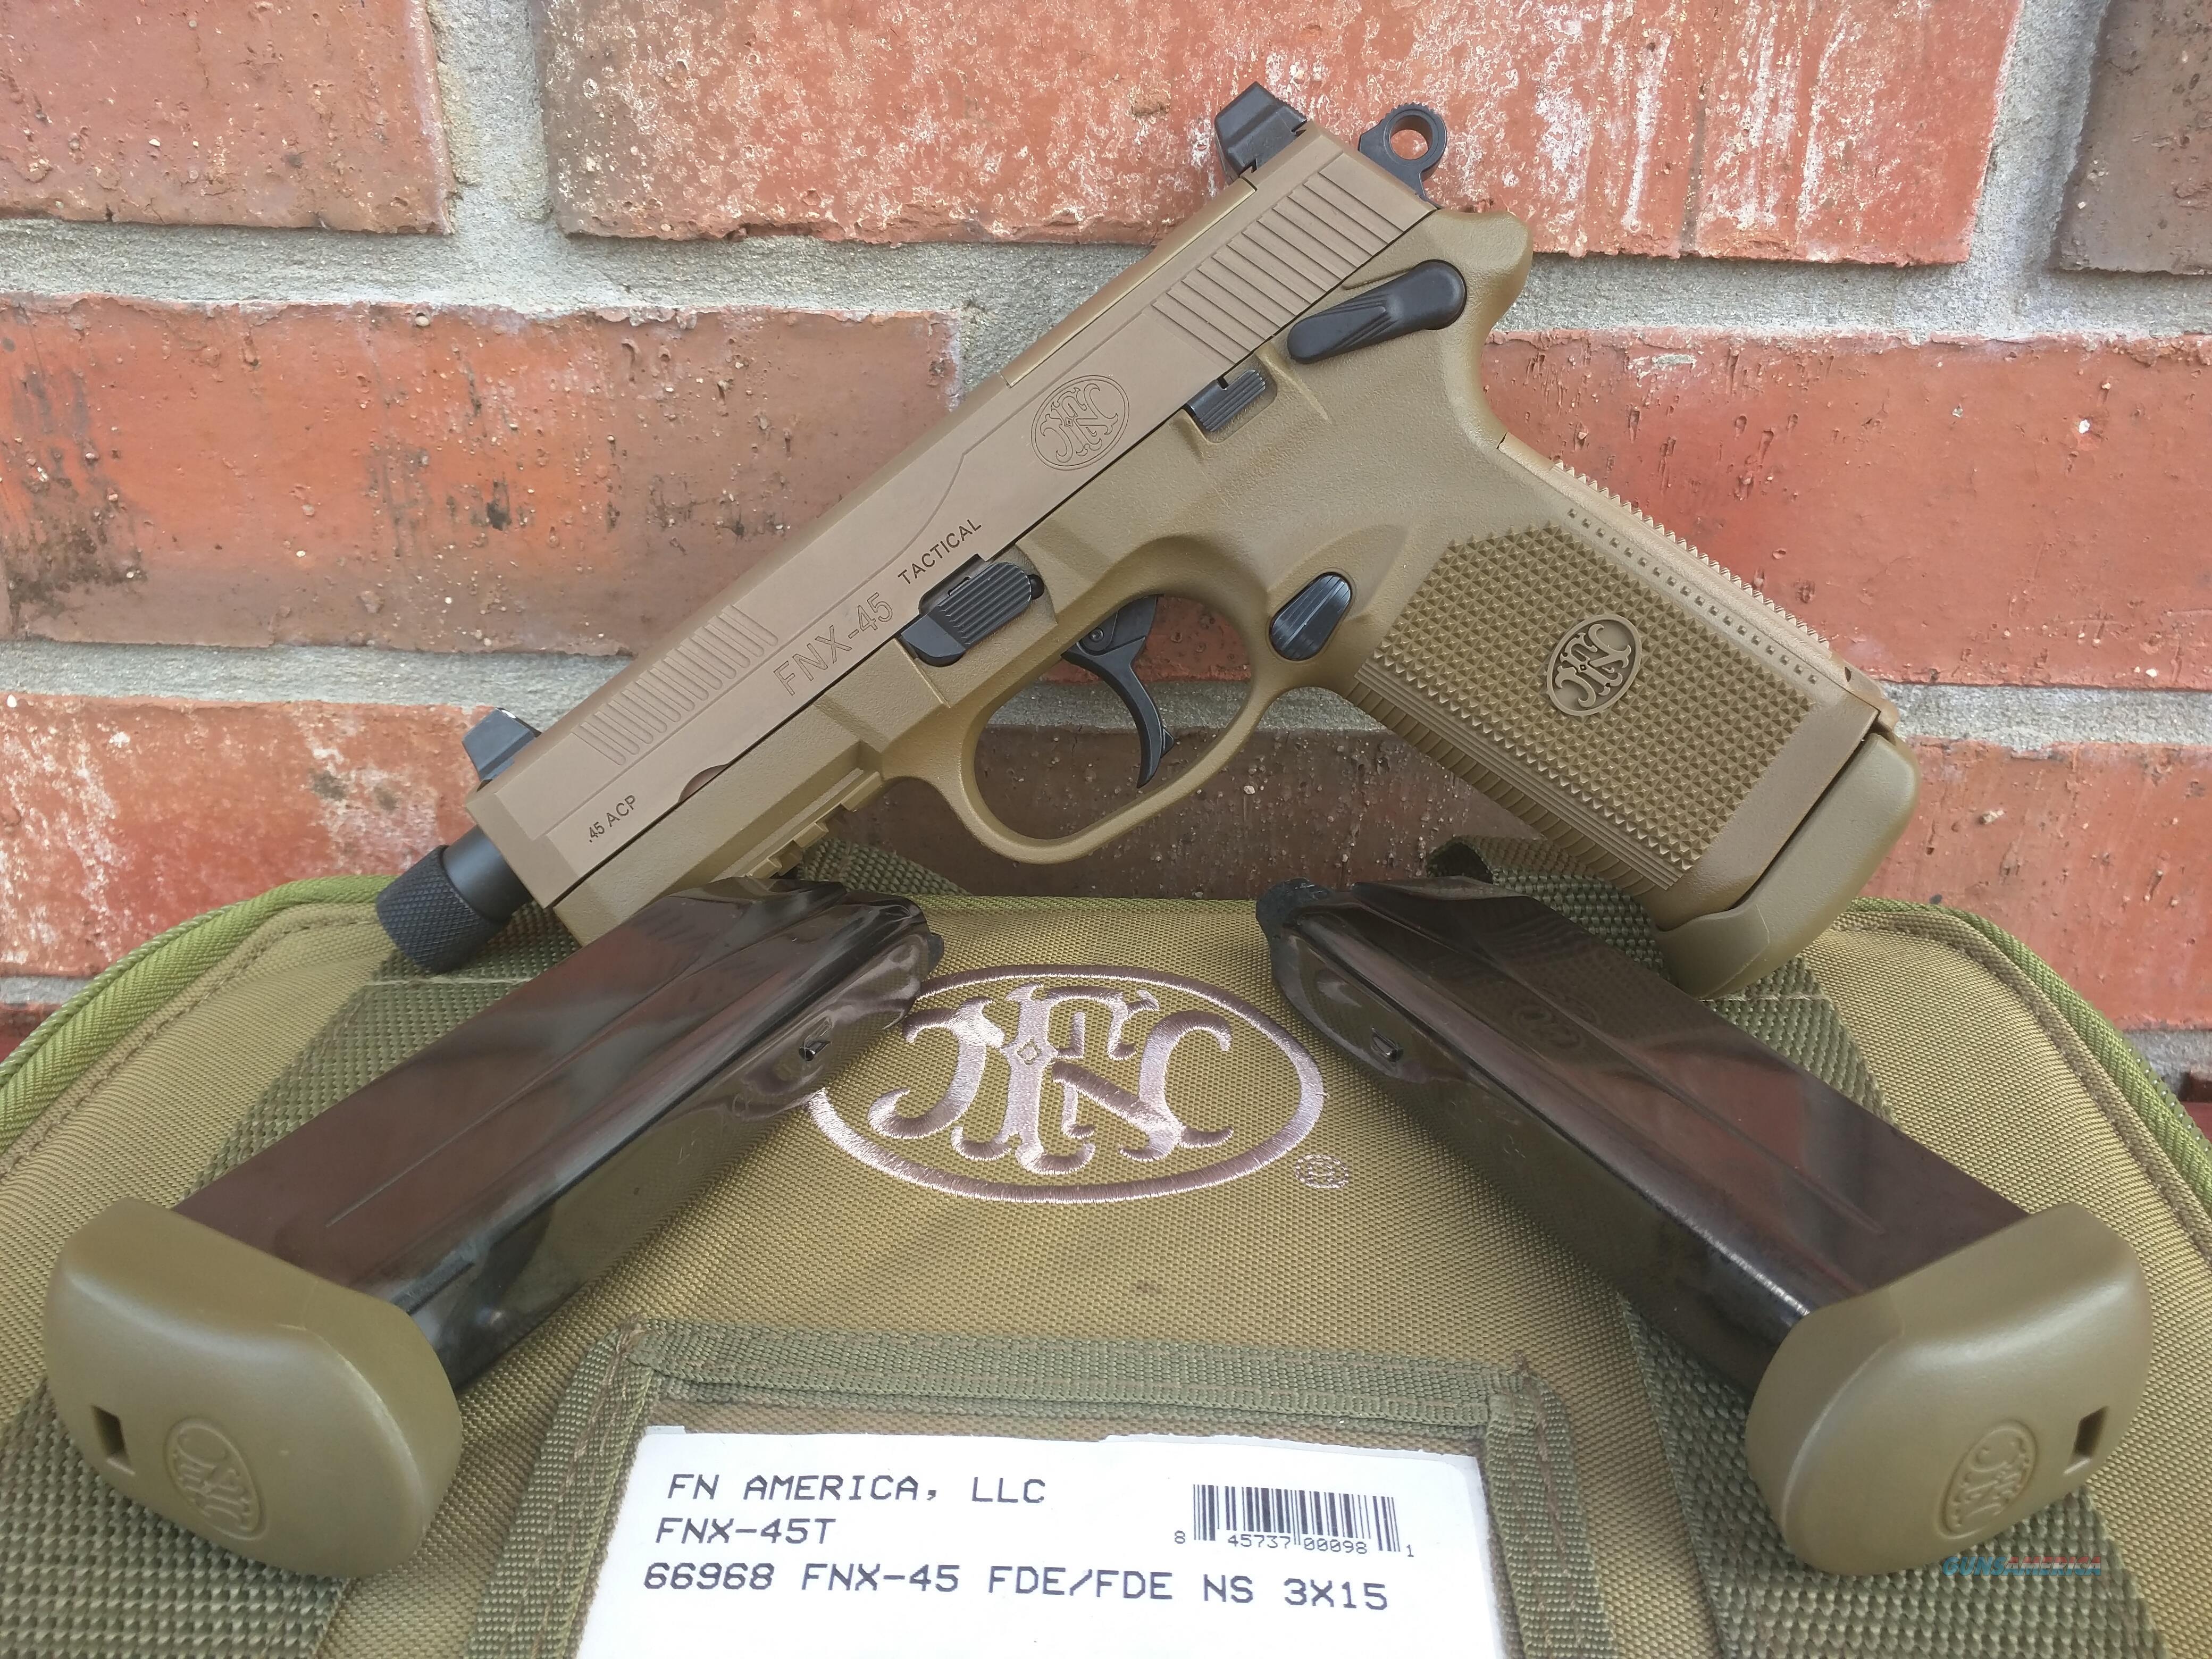 FN FNH FNX-45T ACP FDE,(3) 15 round mags, Threaded barrel, SA/DA, Suppressor height night sights, manual safety, all NIB, FREE LAYAWAY  Guns > Pistols > FNH - Fabrique Nationale (FN) Pistols > FNX